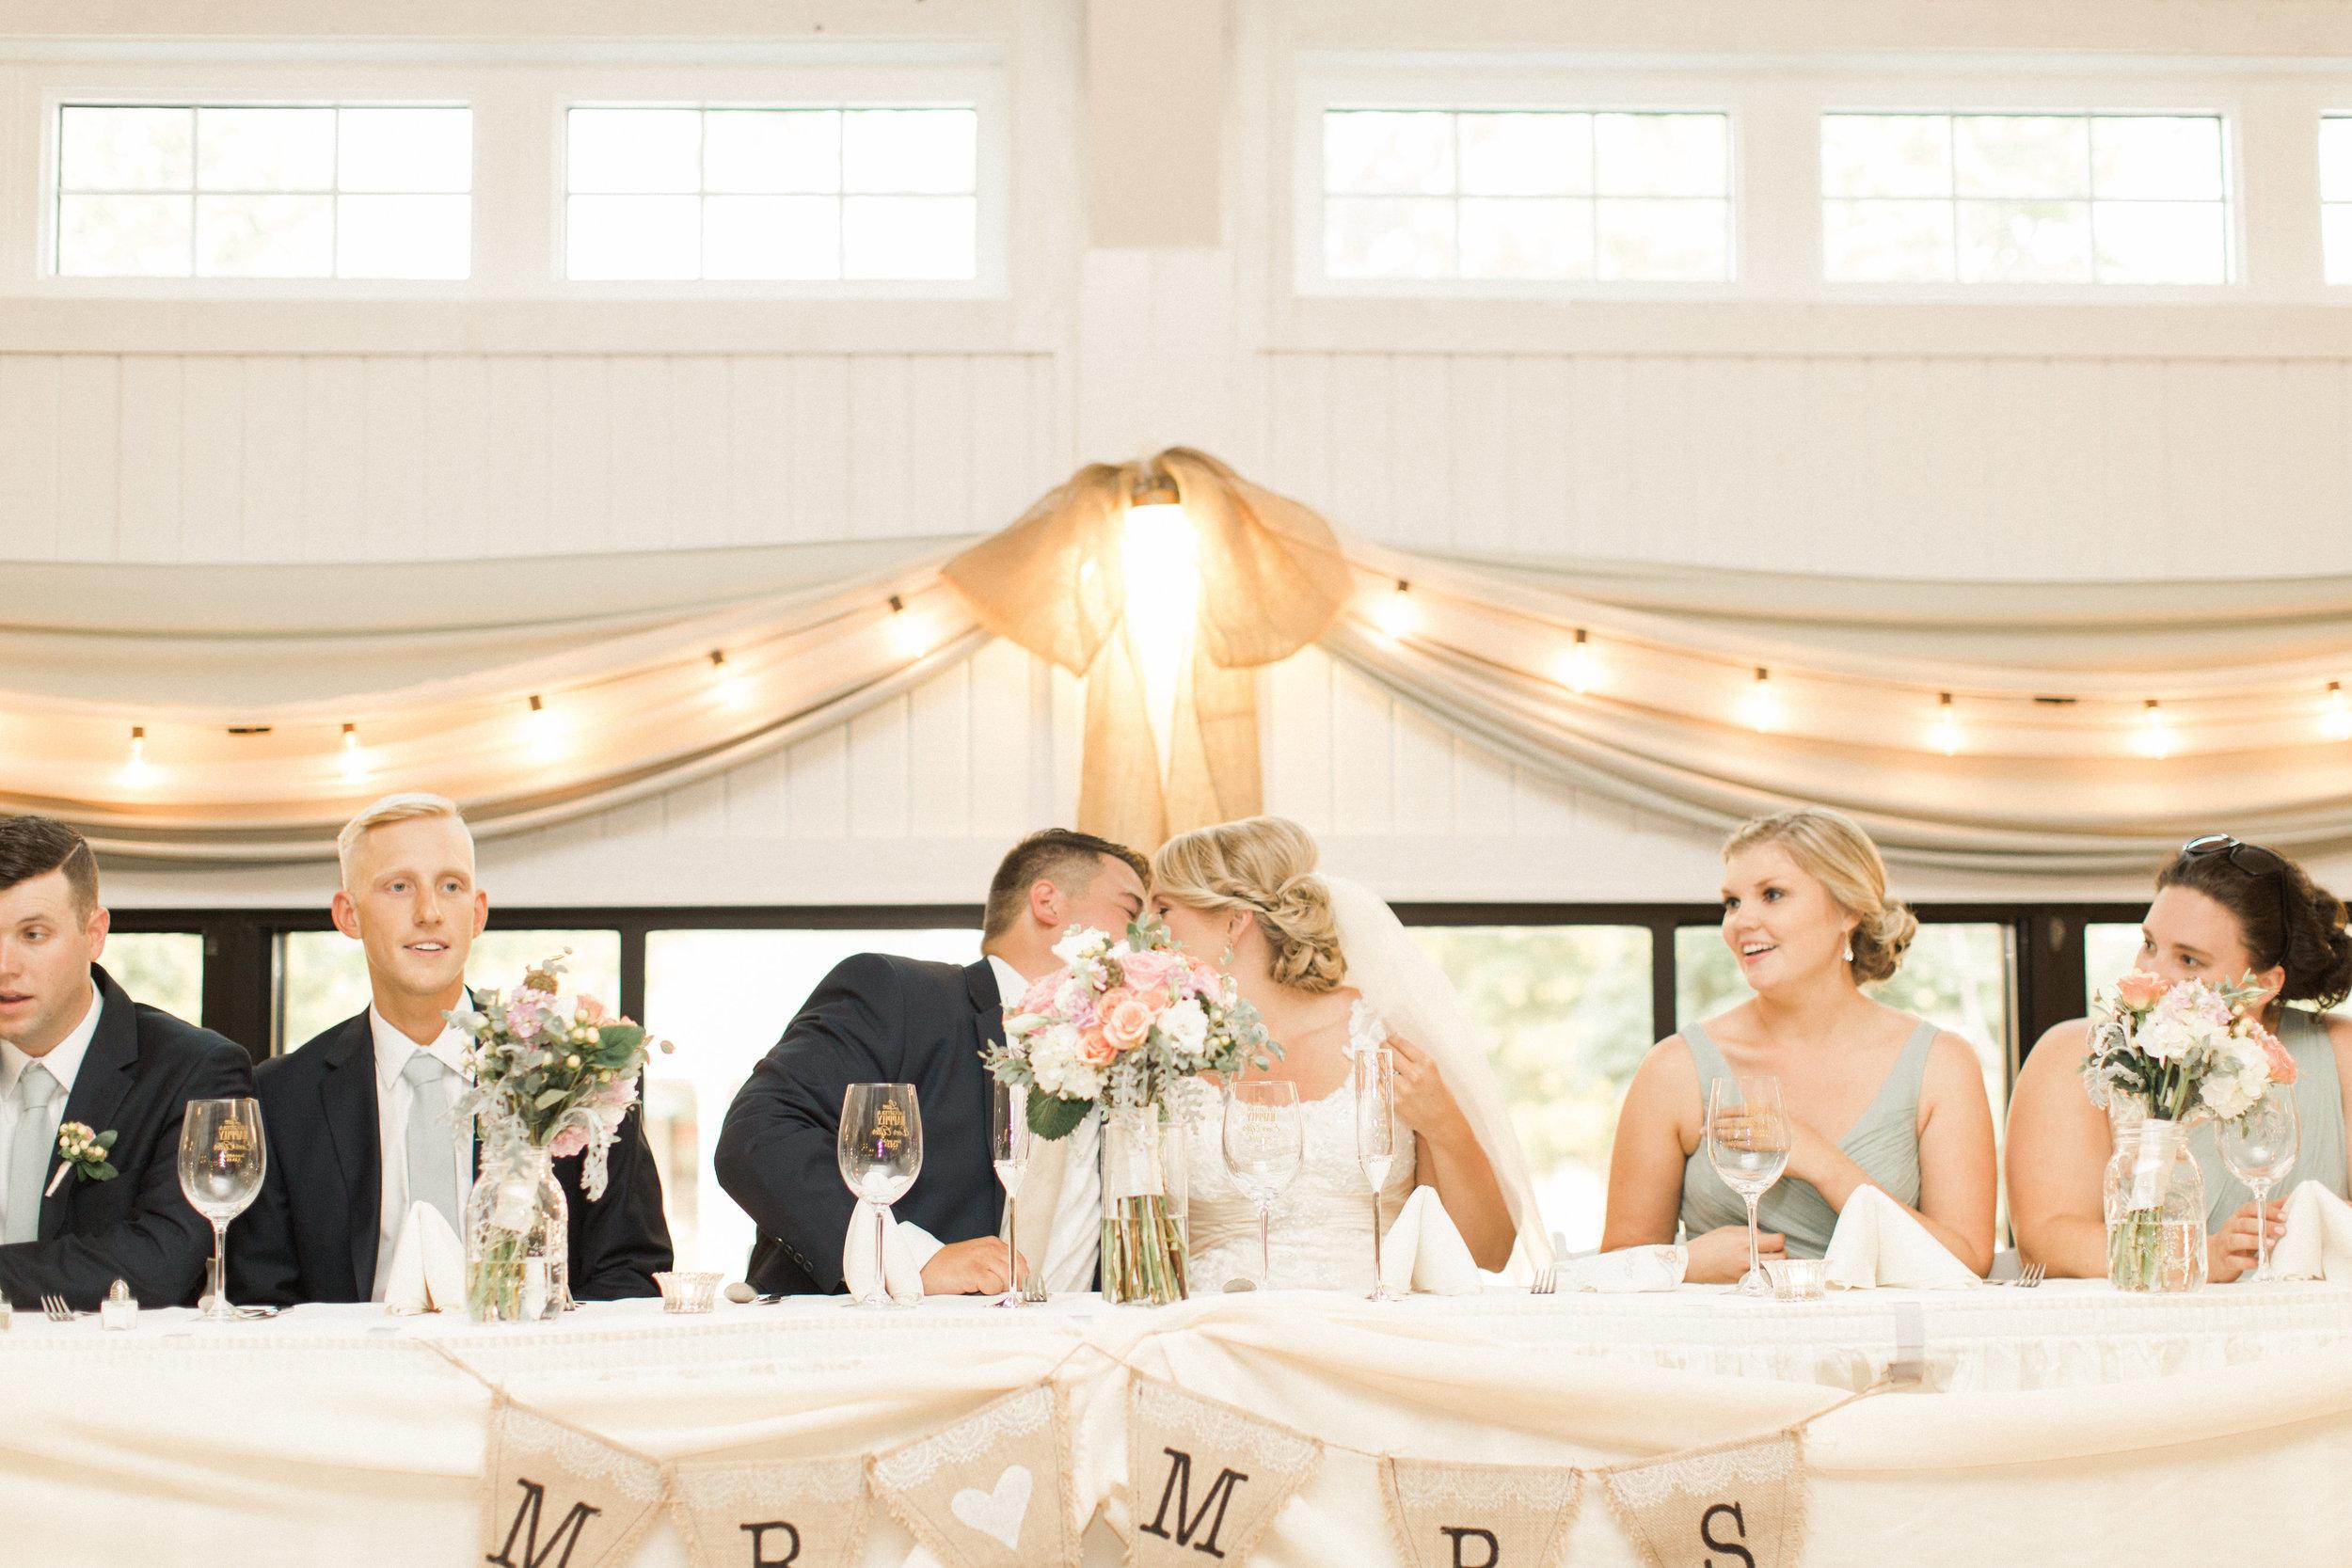 head-table-white-lights-pink-flowers-flags-bride-groom-kiss